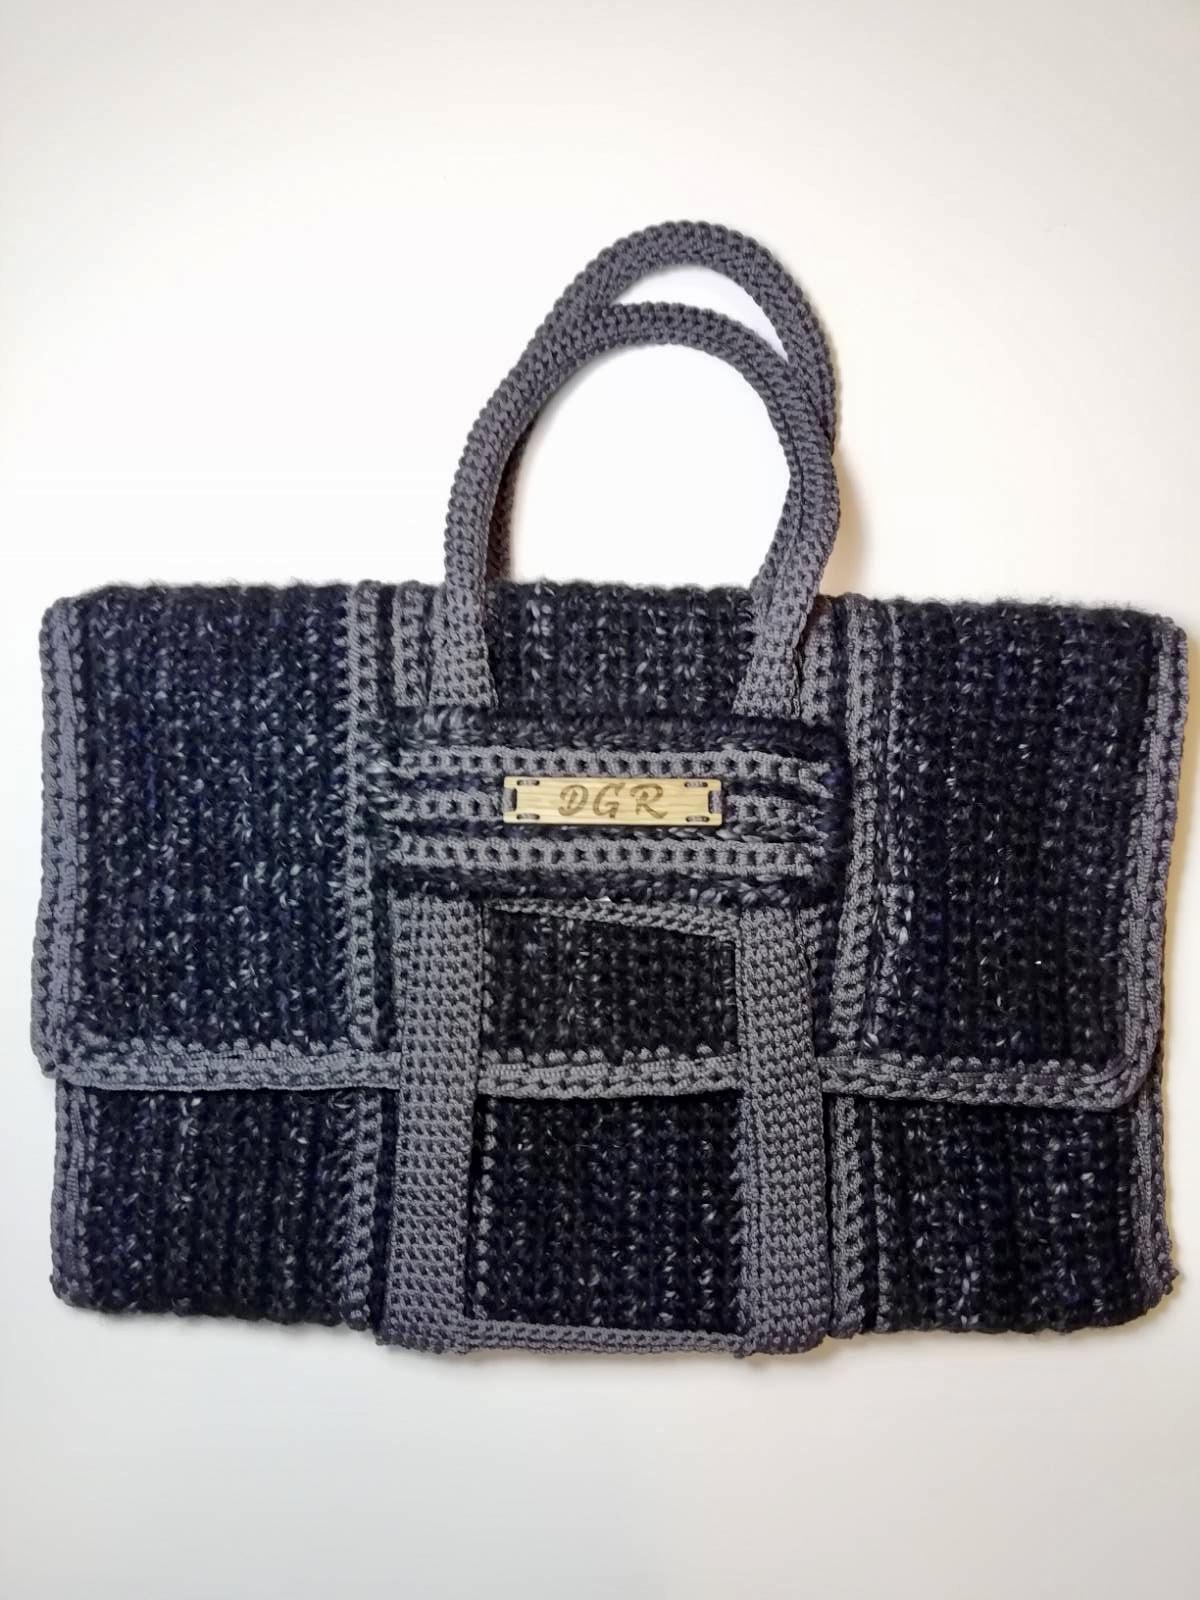 Crochet Bag in black/grey